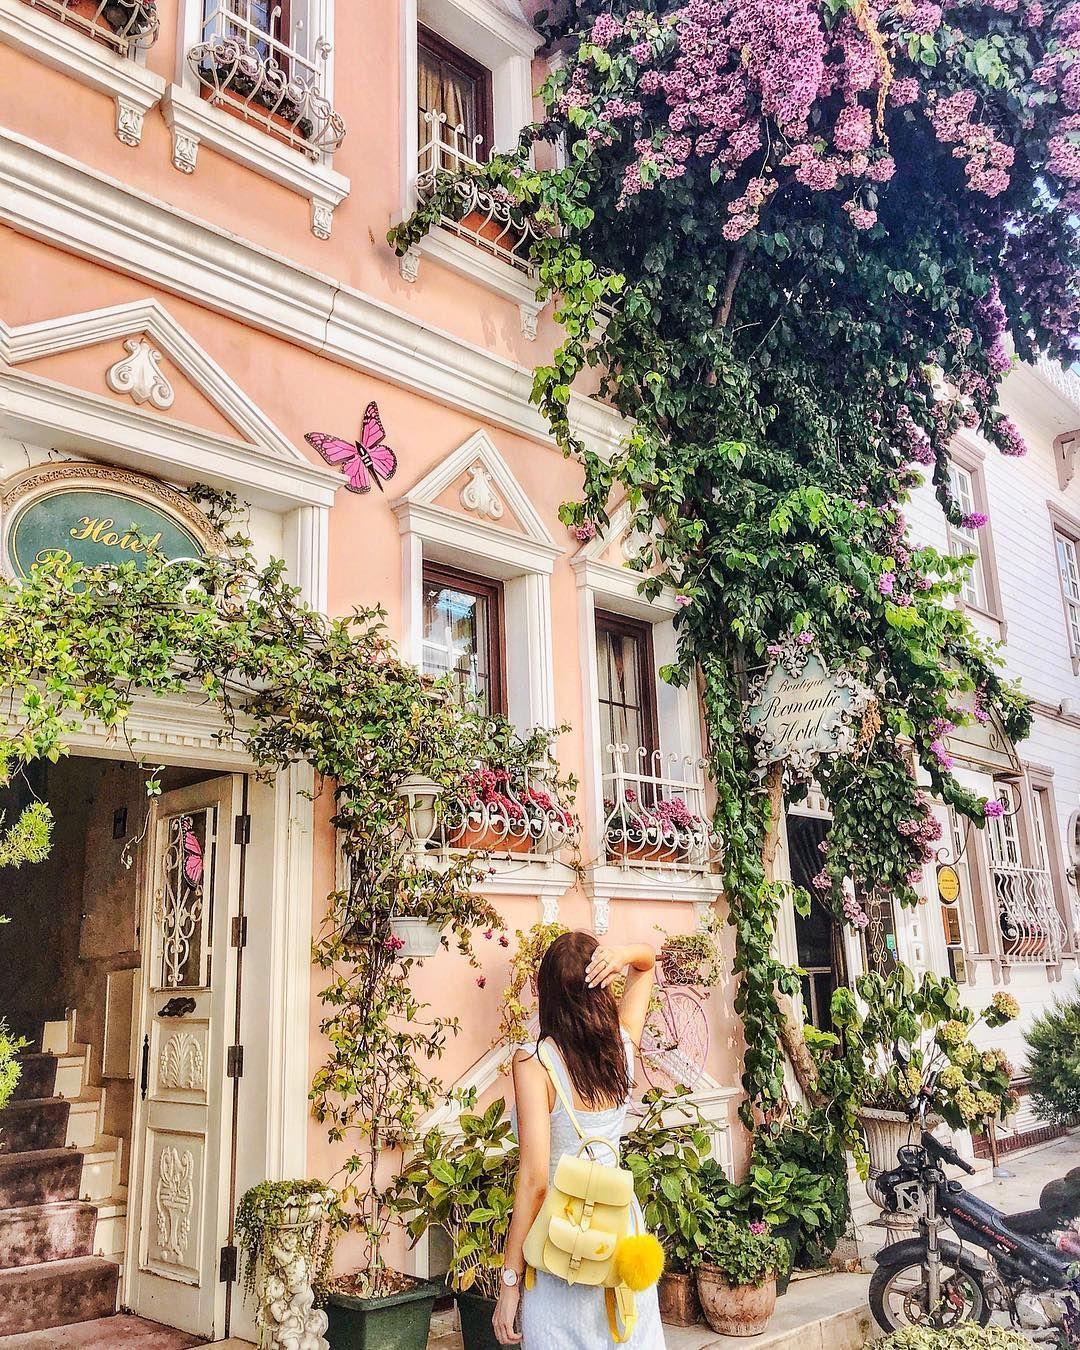 to secret garden in the heart of the city 🌸в